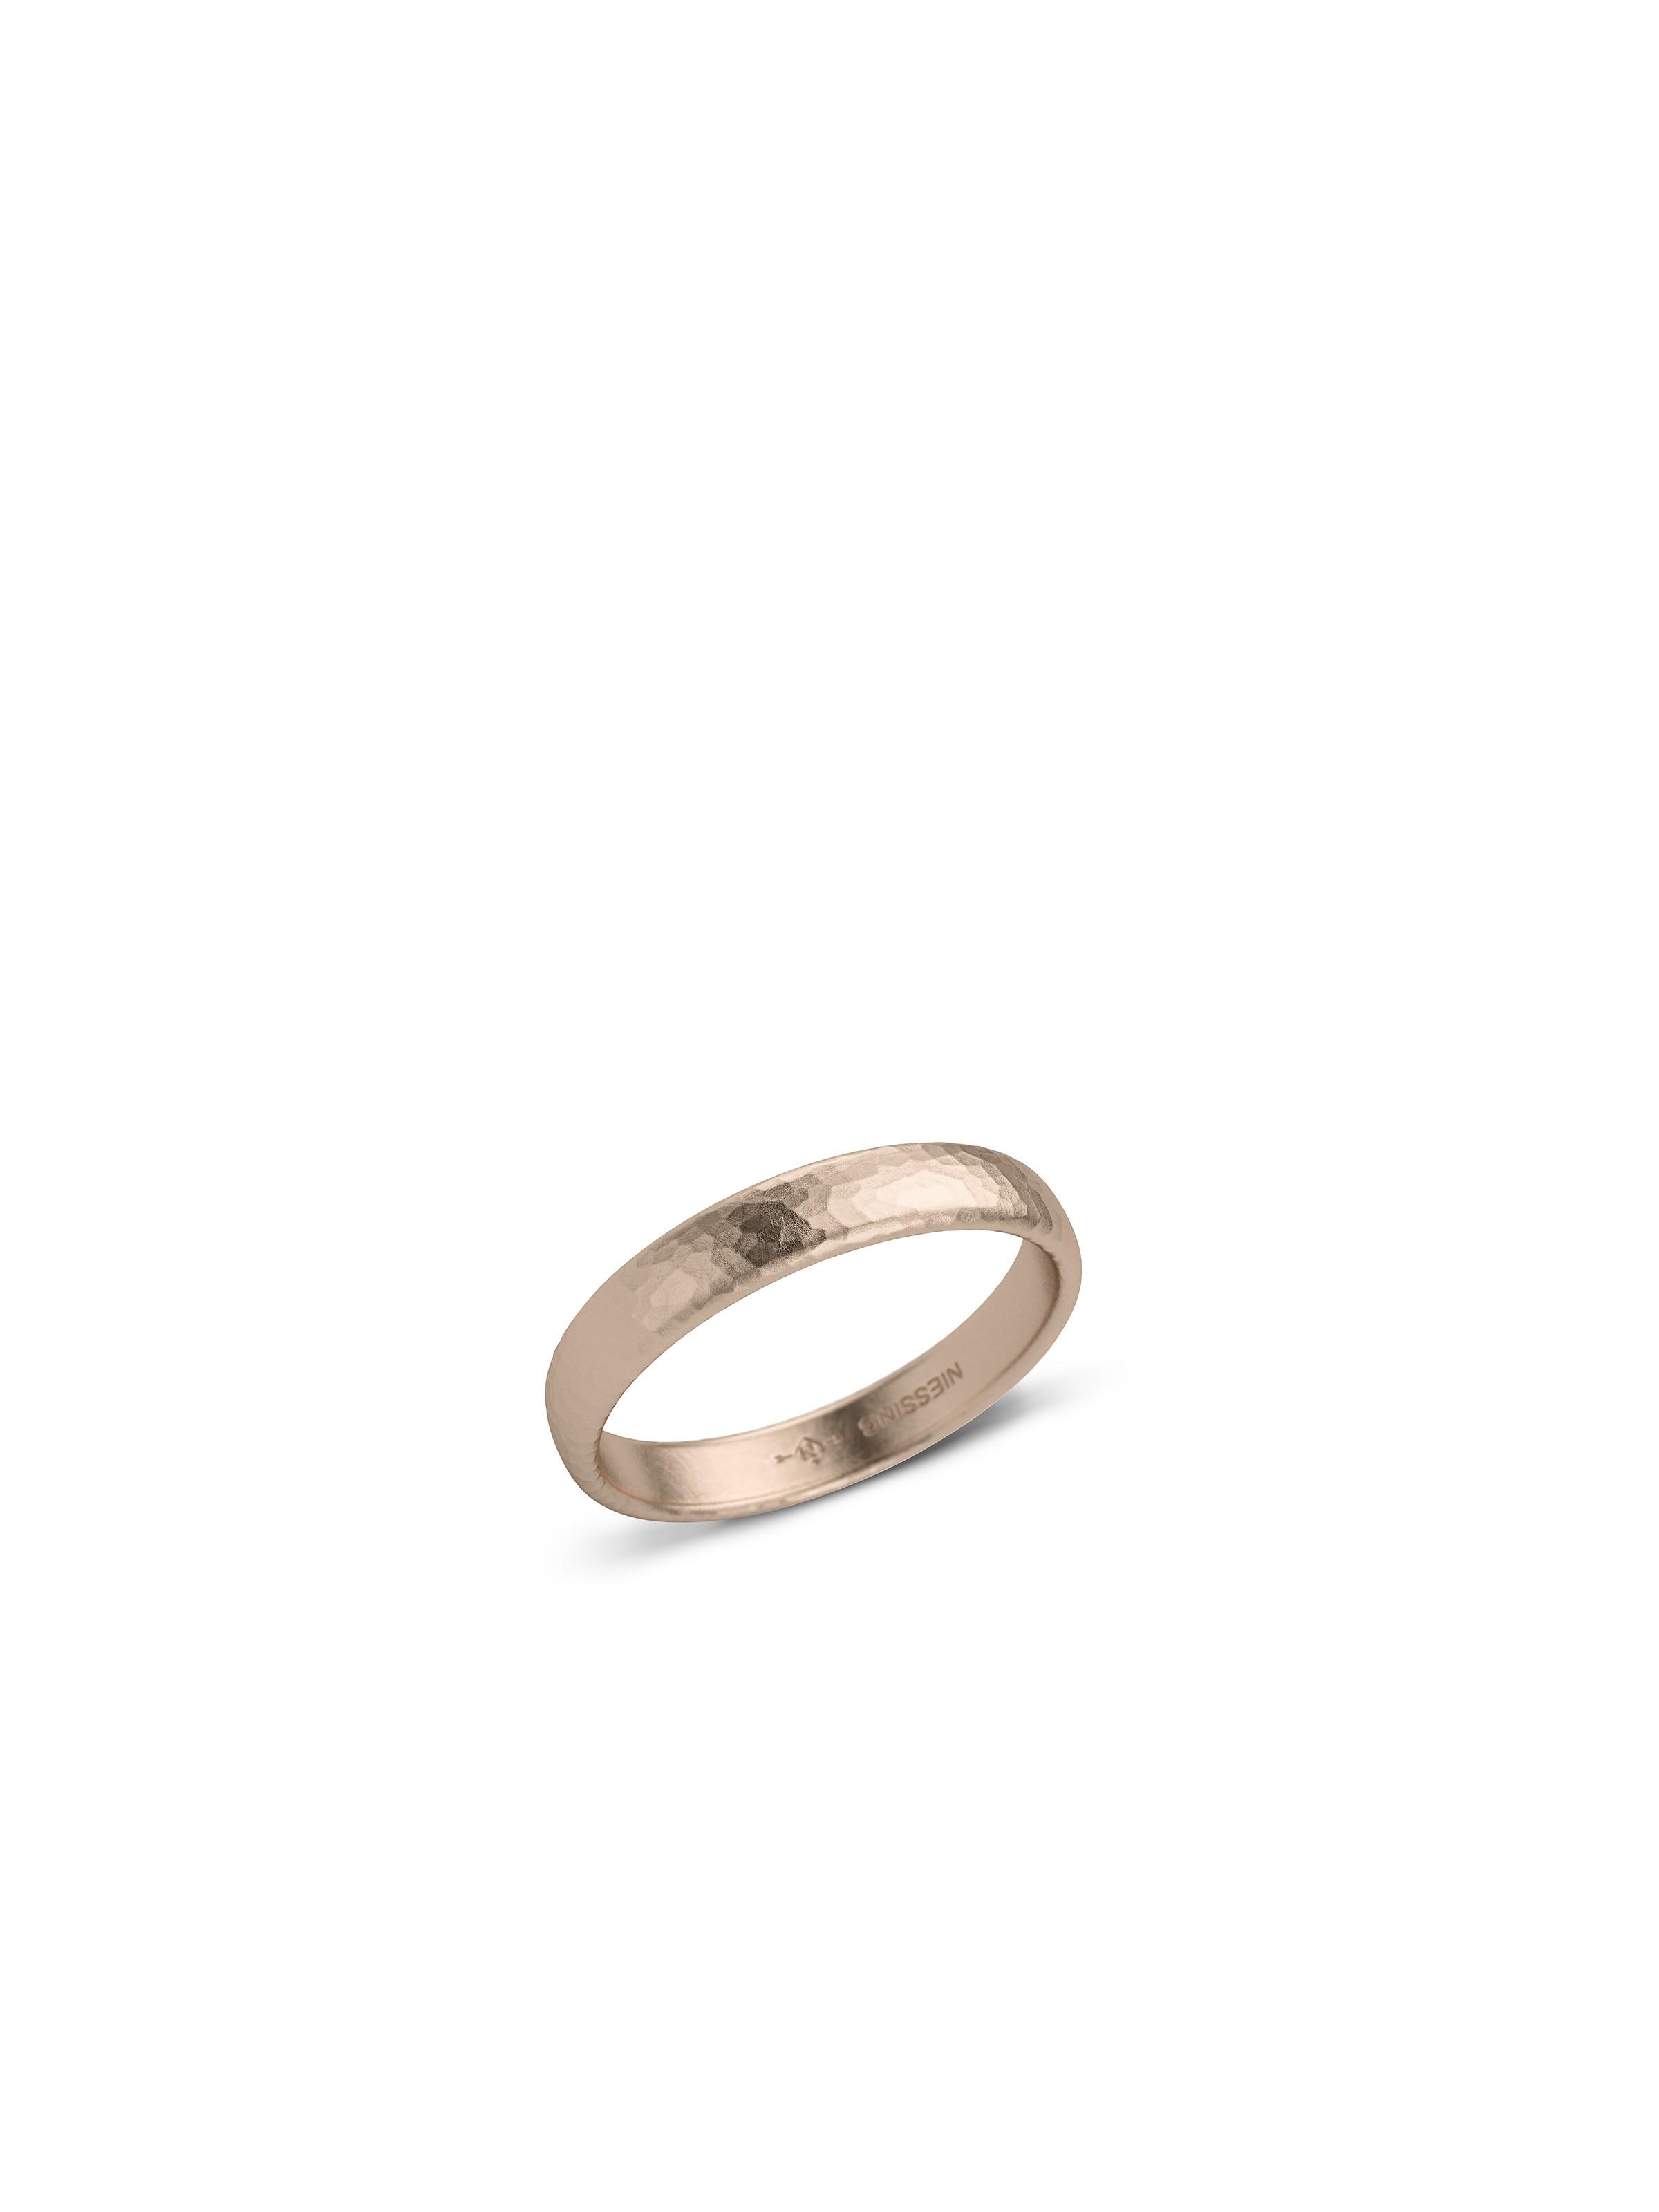 Classic wedding ring -curved/flat- hammer blow matt surface